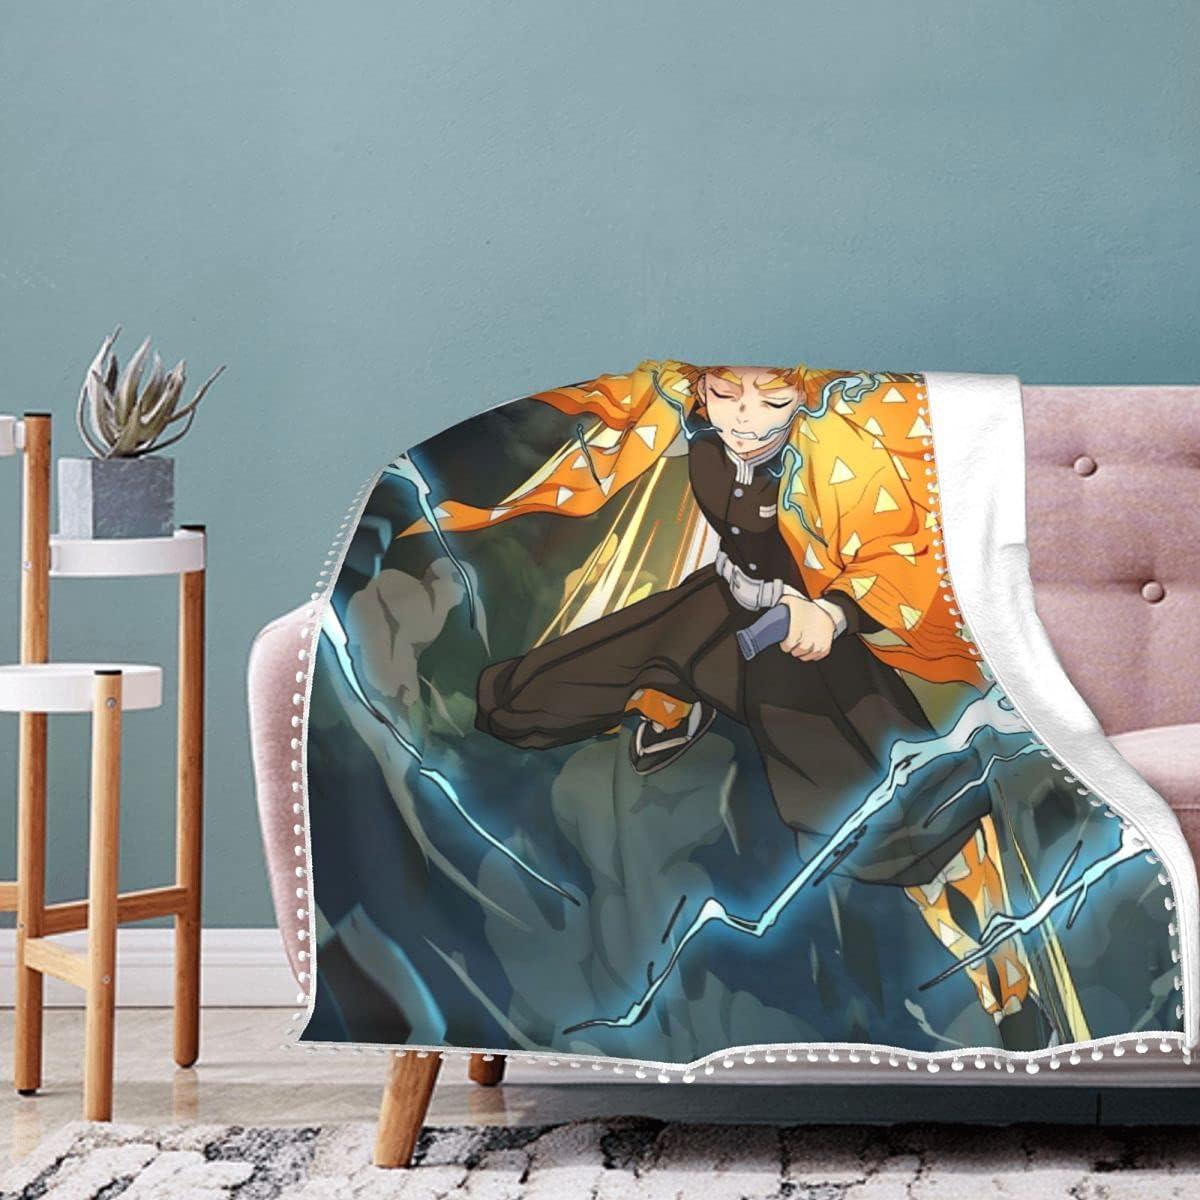 Awhgbnl Ultra-Soft Micro Fleece Flannel ,Ds Oklahoma City 2021 autumn and winter new Mall An Zenitsu Blanket